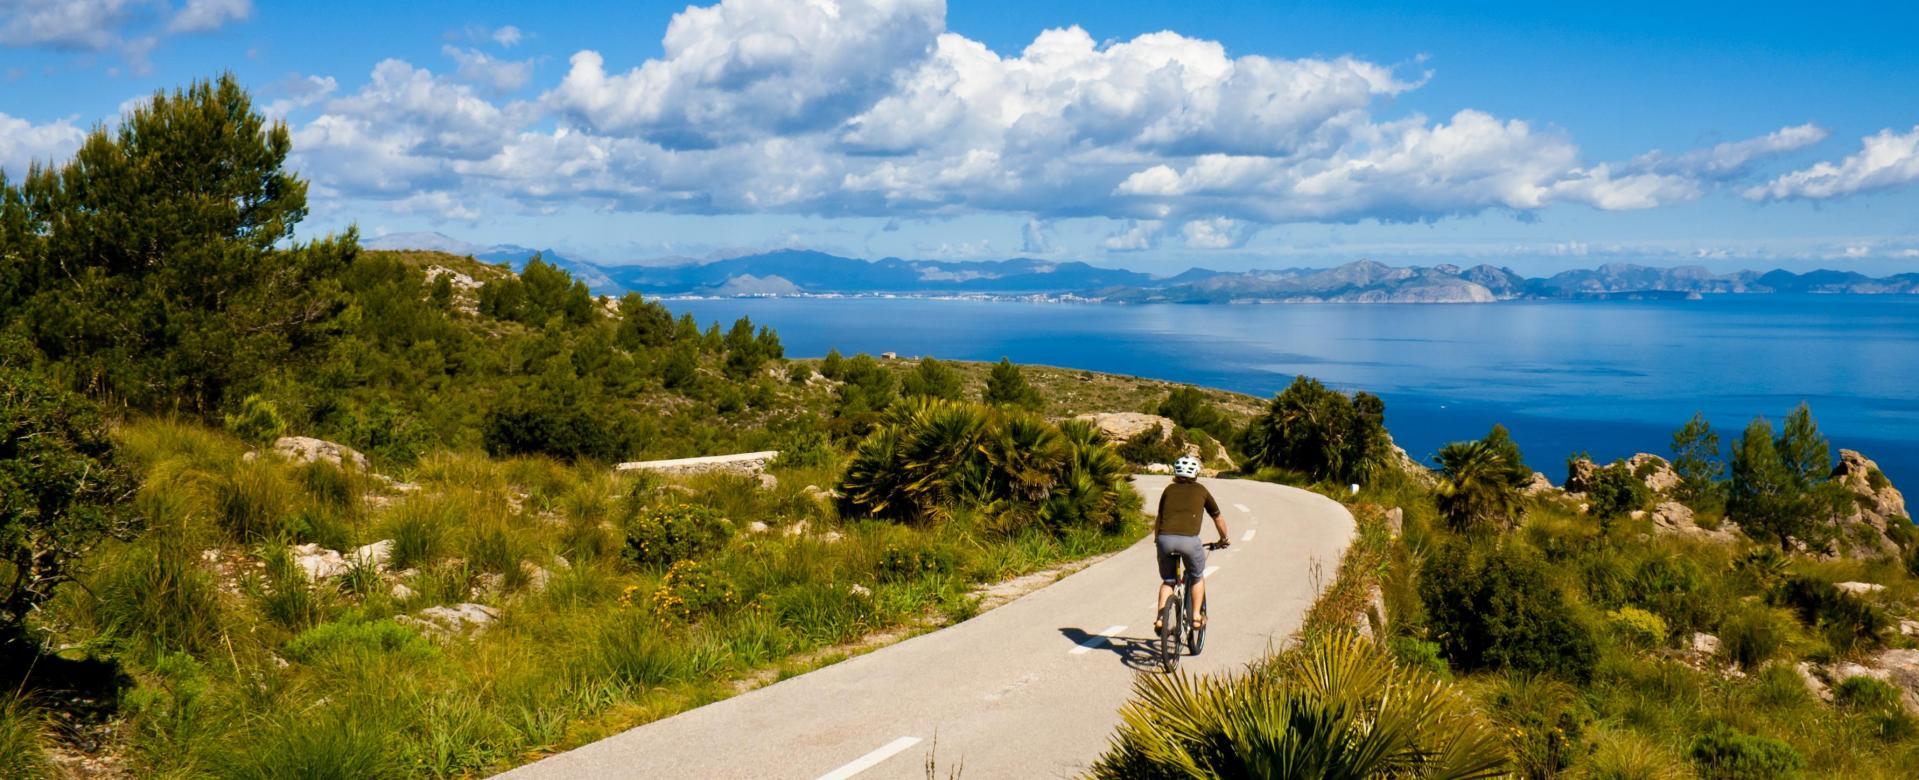 Voyage en véhicule Espagne : Baléares : majorque et minorque à vélo